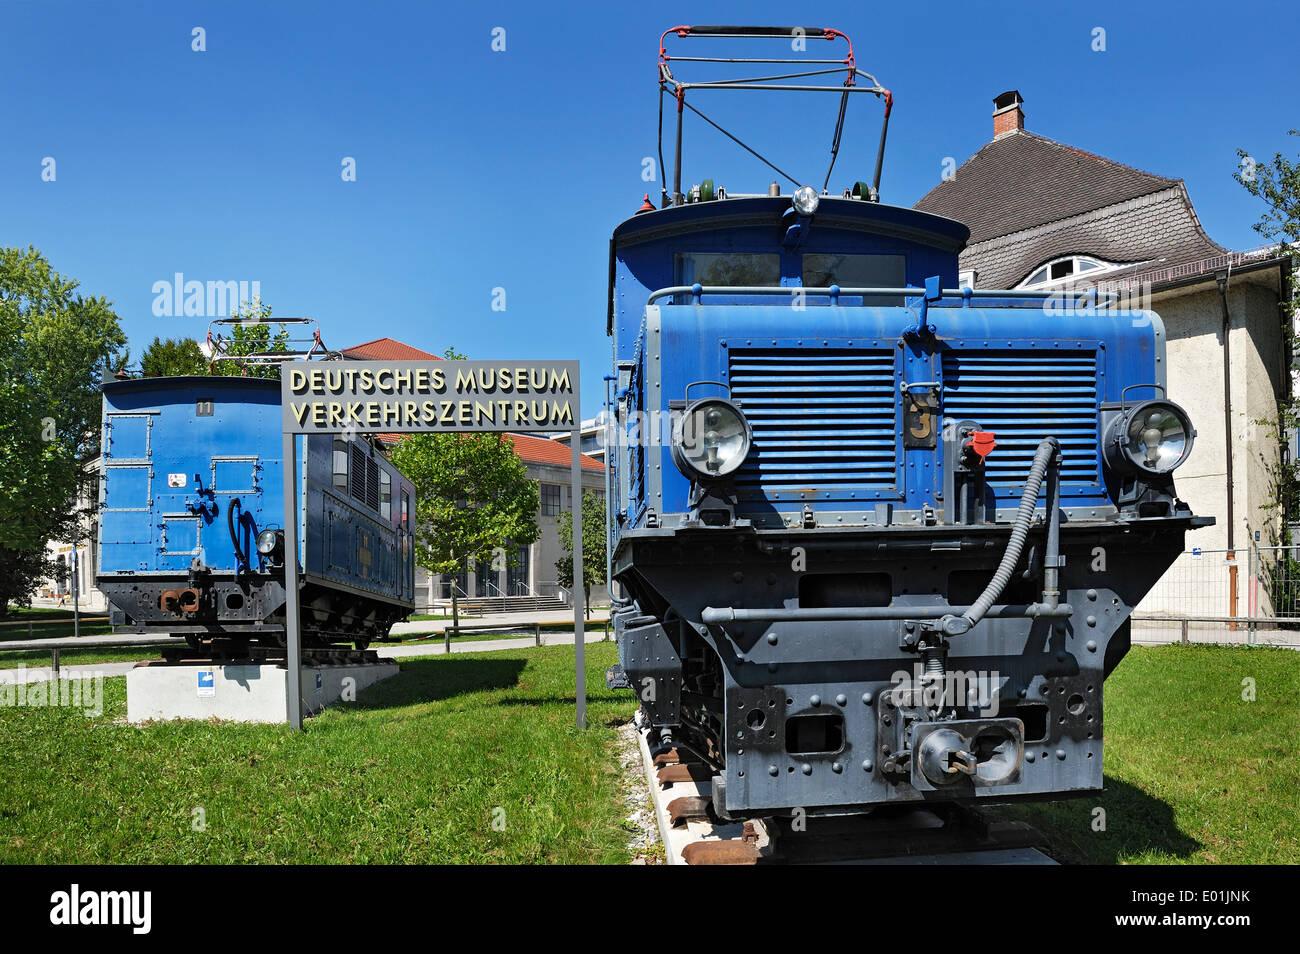 Locomotive of the Zugspitzbahn railway of 1929, Deutsches Museum Verkehrszentrum, German Museum Transportation Centre, Munich - Stock Image